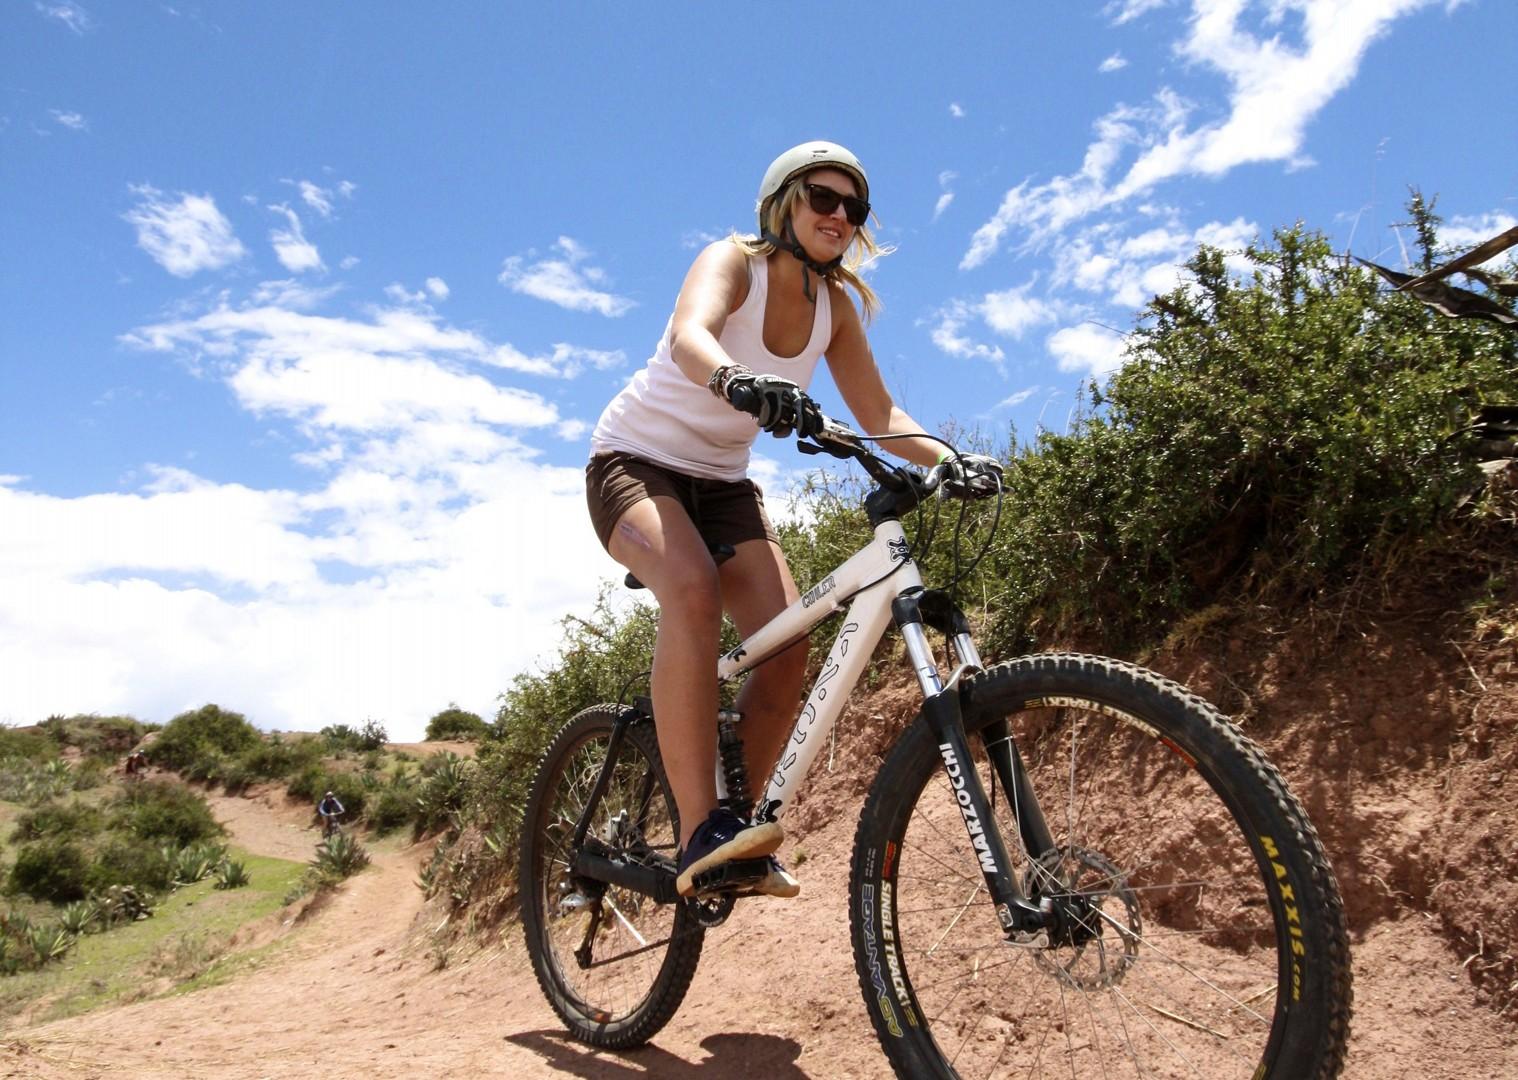 BAS Girl on Bike.jpg - Peru - Andes, Amazon and Machu Picchu - Cycling Adventures